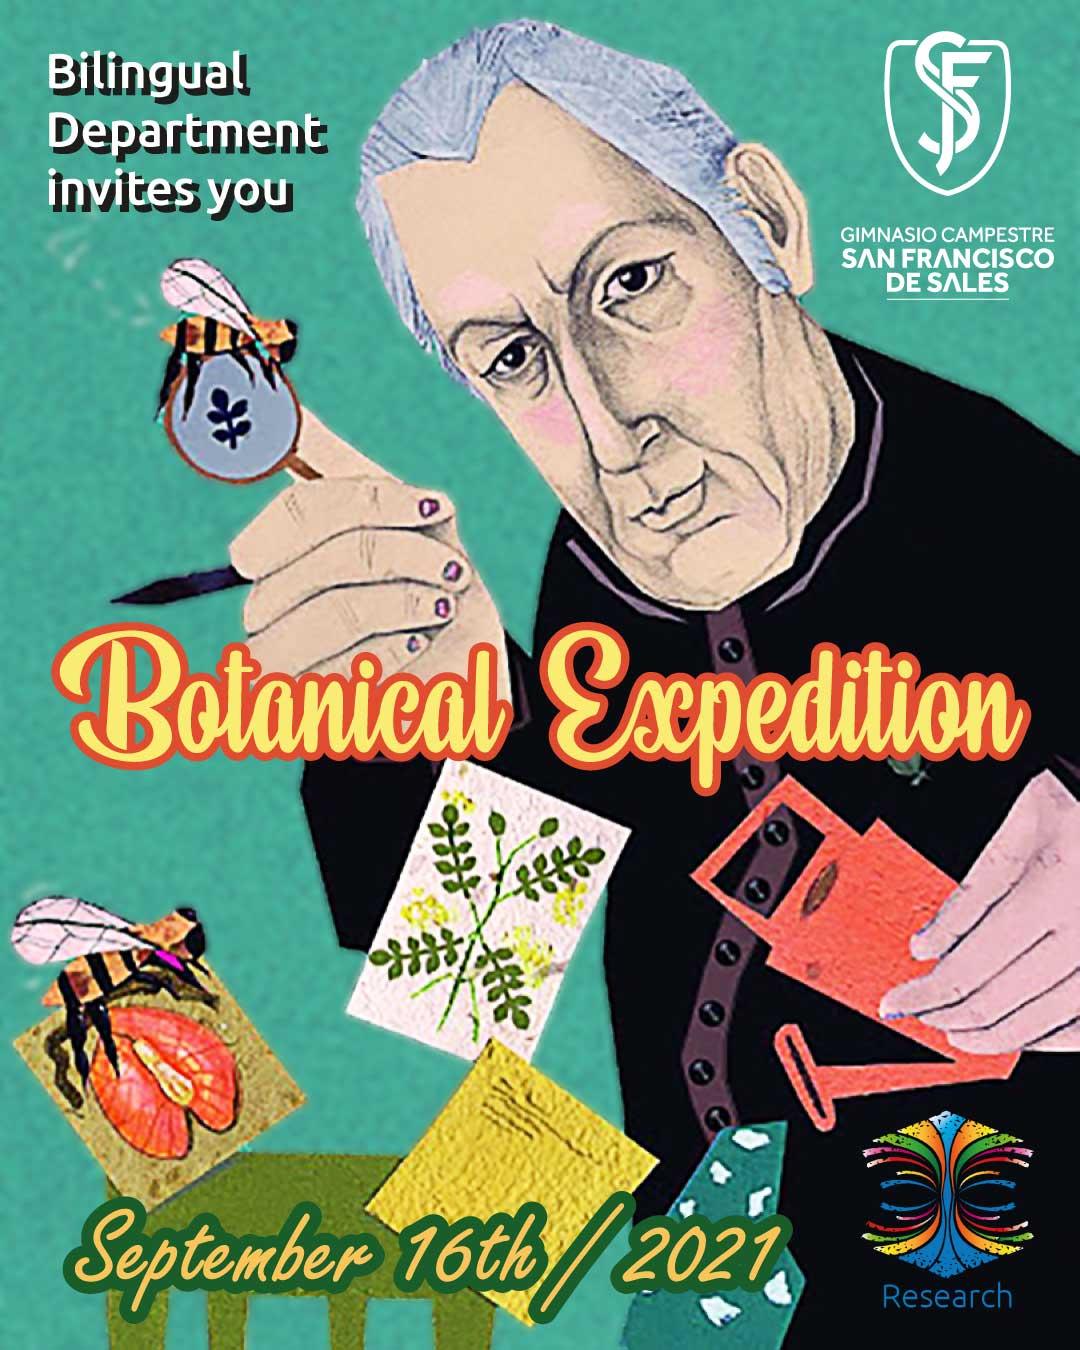 Botanical-Expedition-September-15th2021